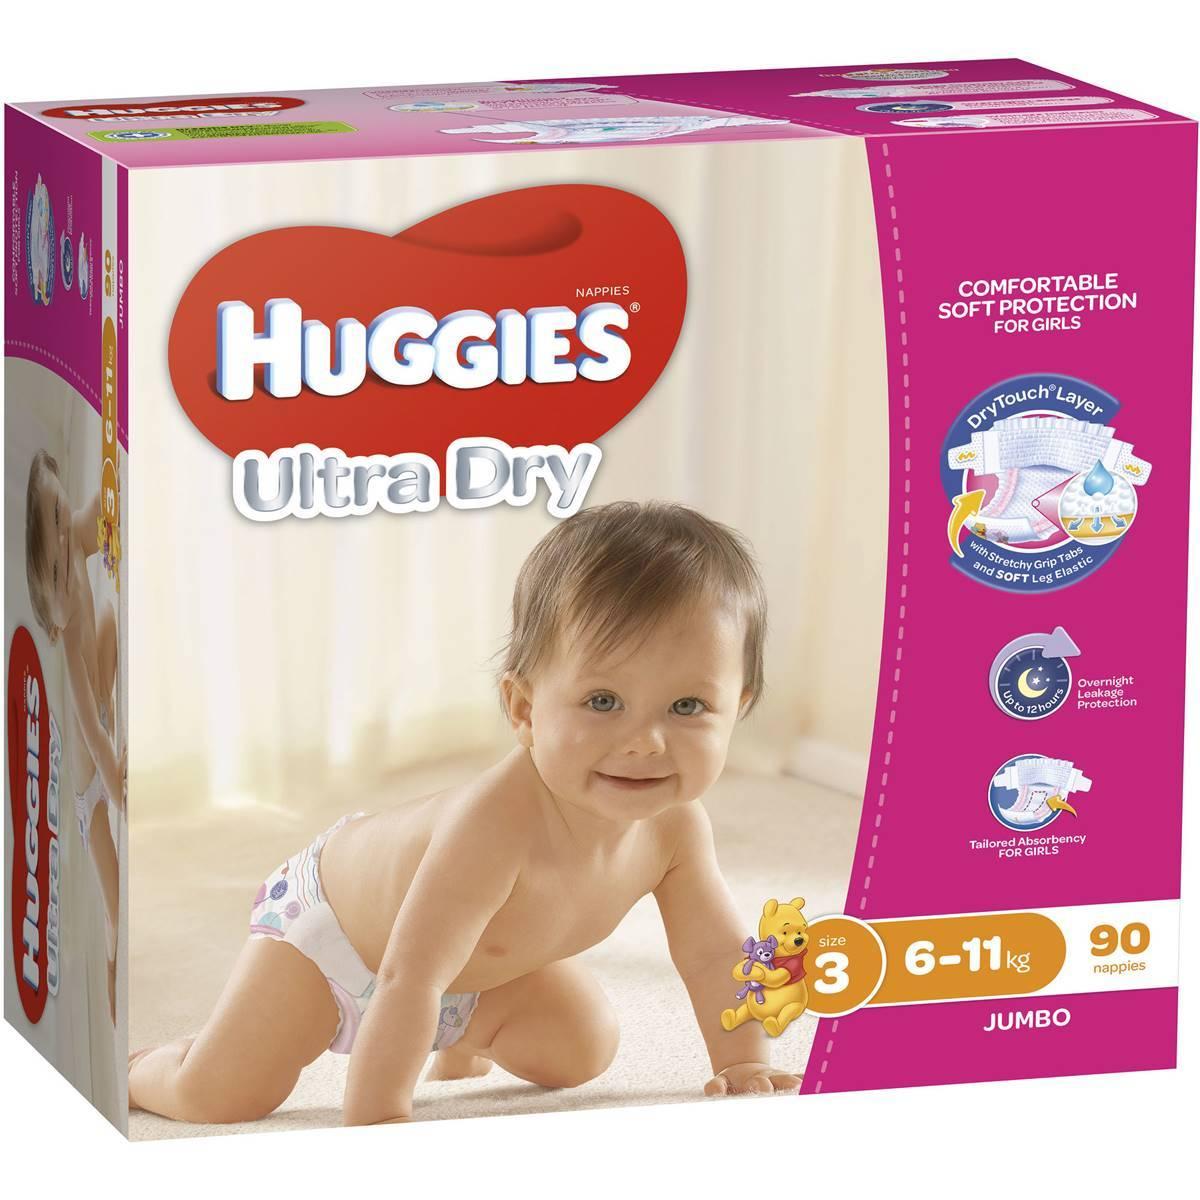 Huggies Ultra Dry Nappies Jumbo Pack - Size 3 Crawler Girl (90) image